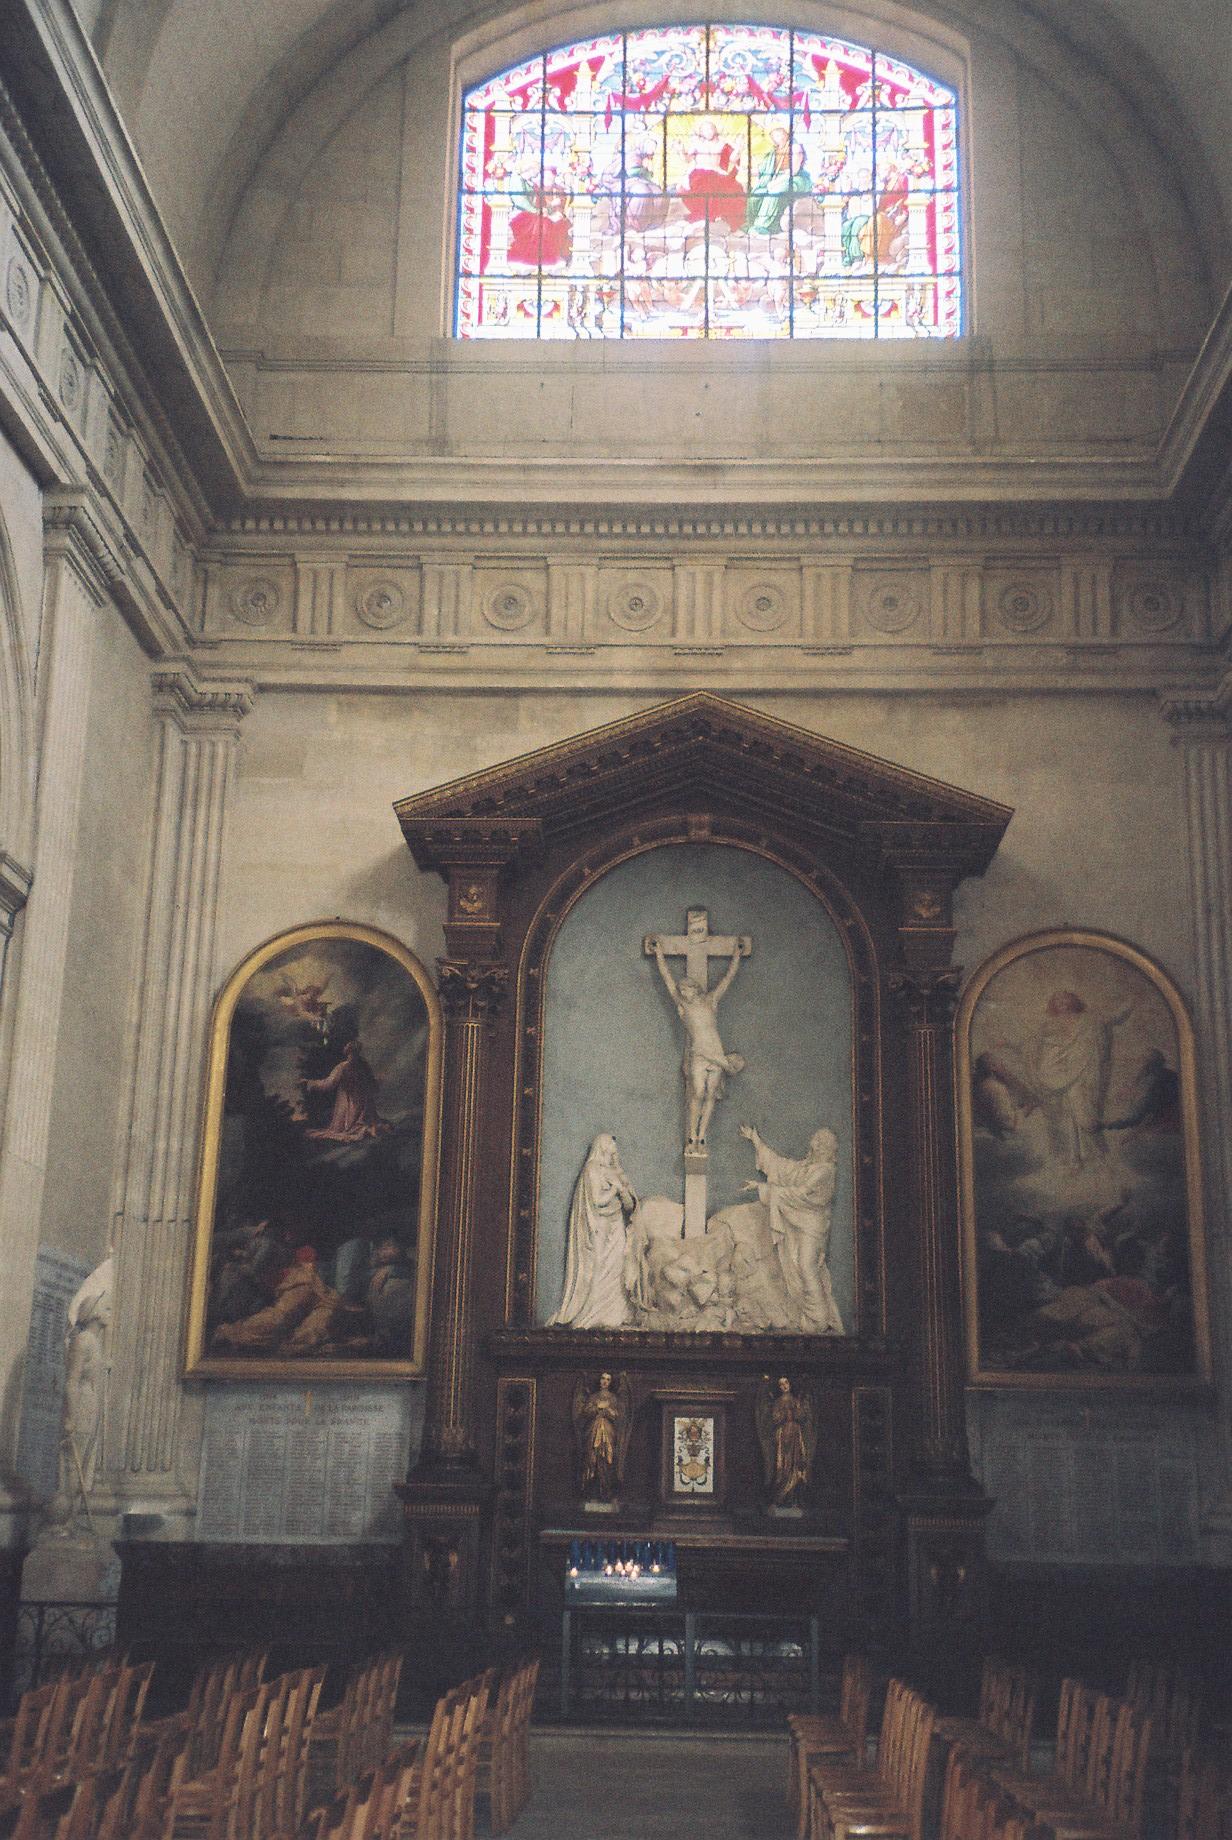 poissy-coll-ch-nd-chapel-of-resurrection-et-jeanne-d-arc-feb11